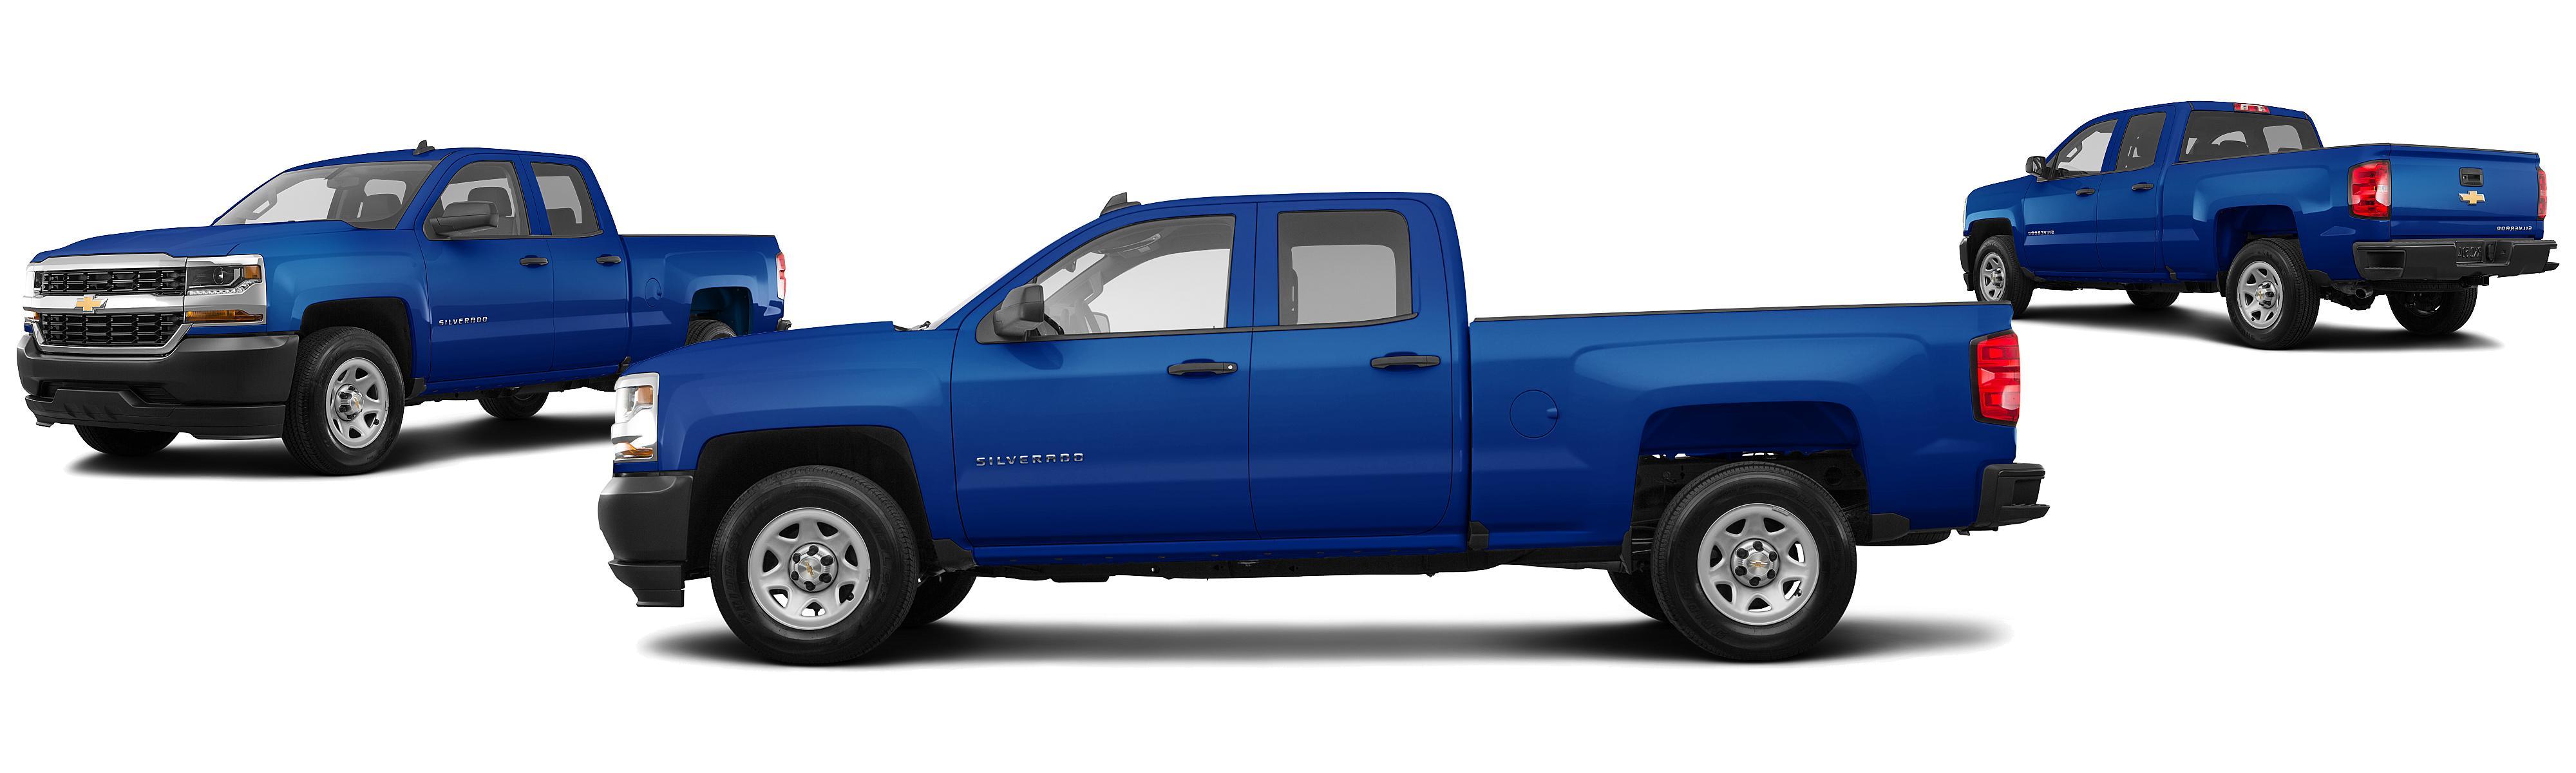 carpet beds vidalondon com hermeymonica kit pics l for of sale pickup kits truck bed gmc beautiful